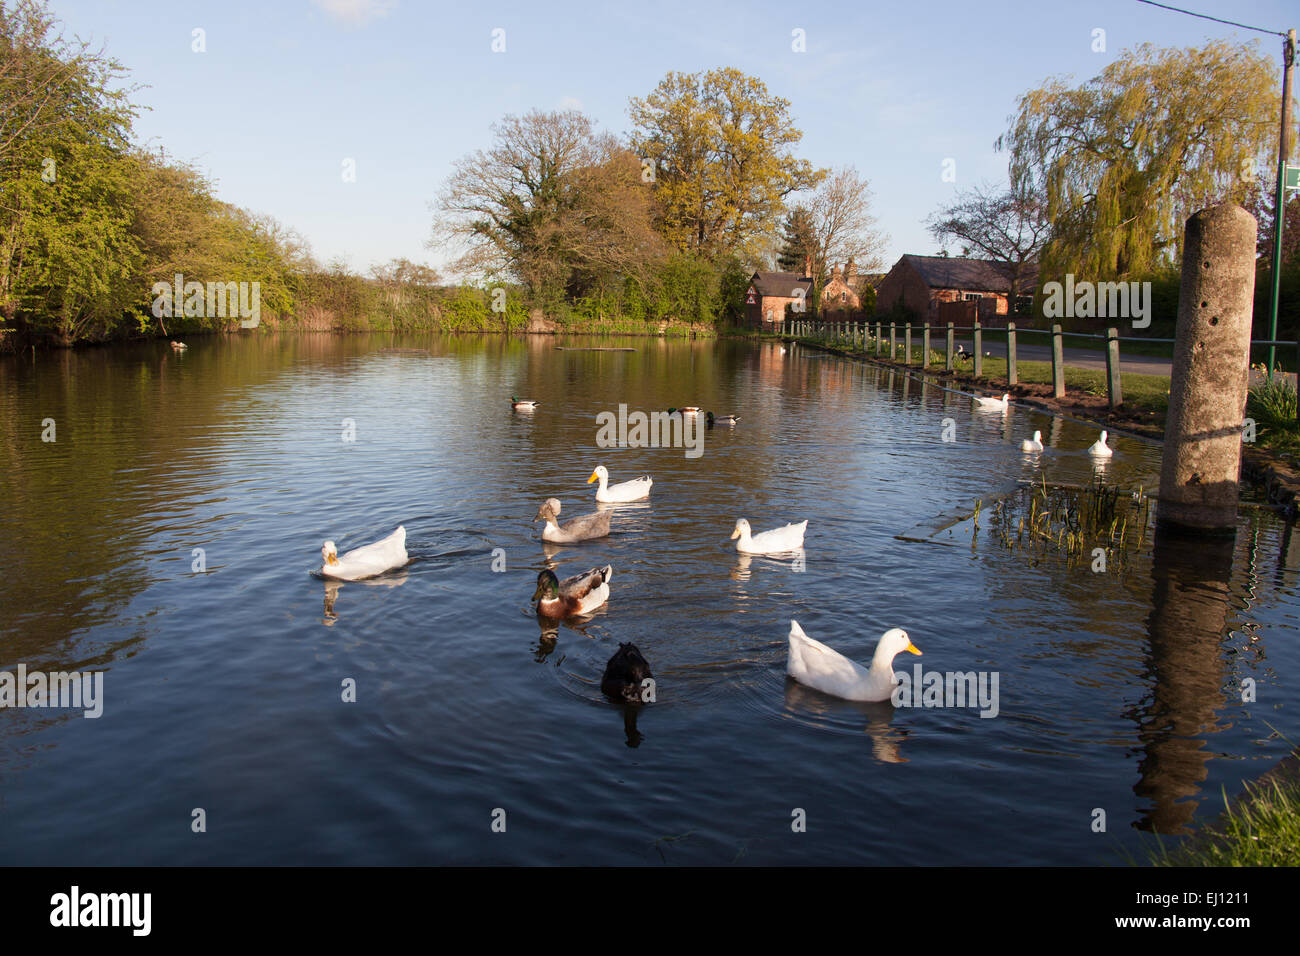 village of coddington cheshire england picturesque spring view